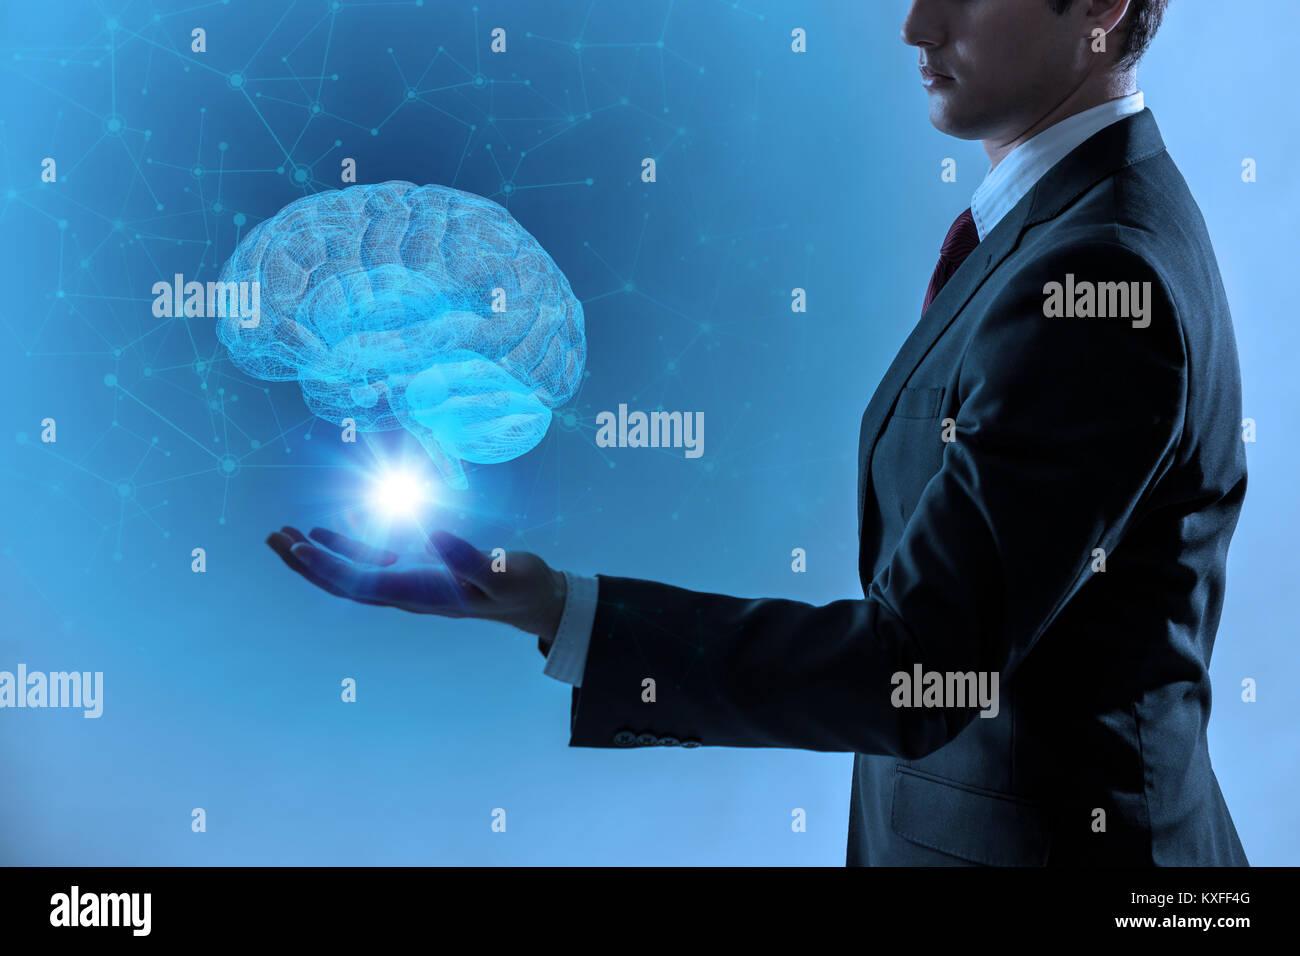 Ki (Künstliche Intelligenz) Konzept, 3D-Rendering Stockbild